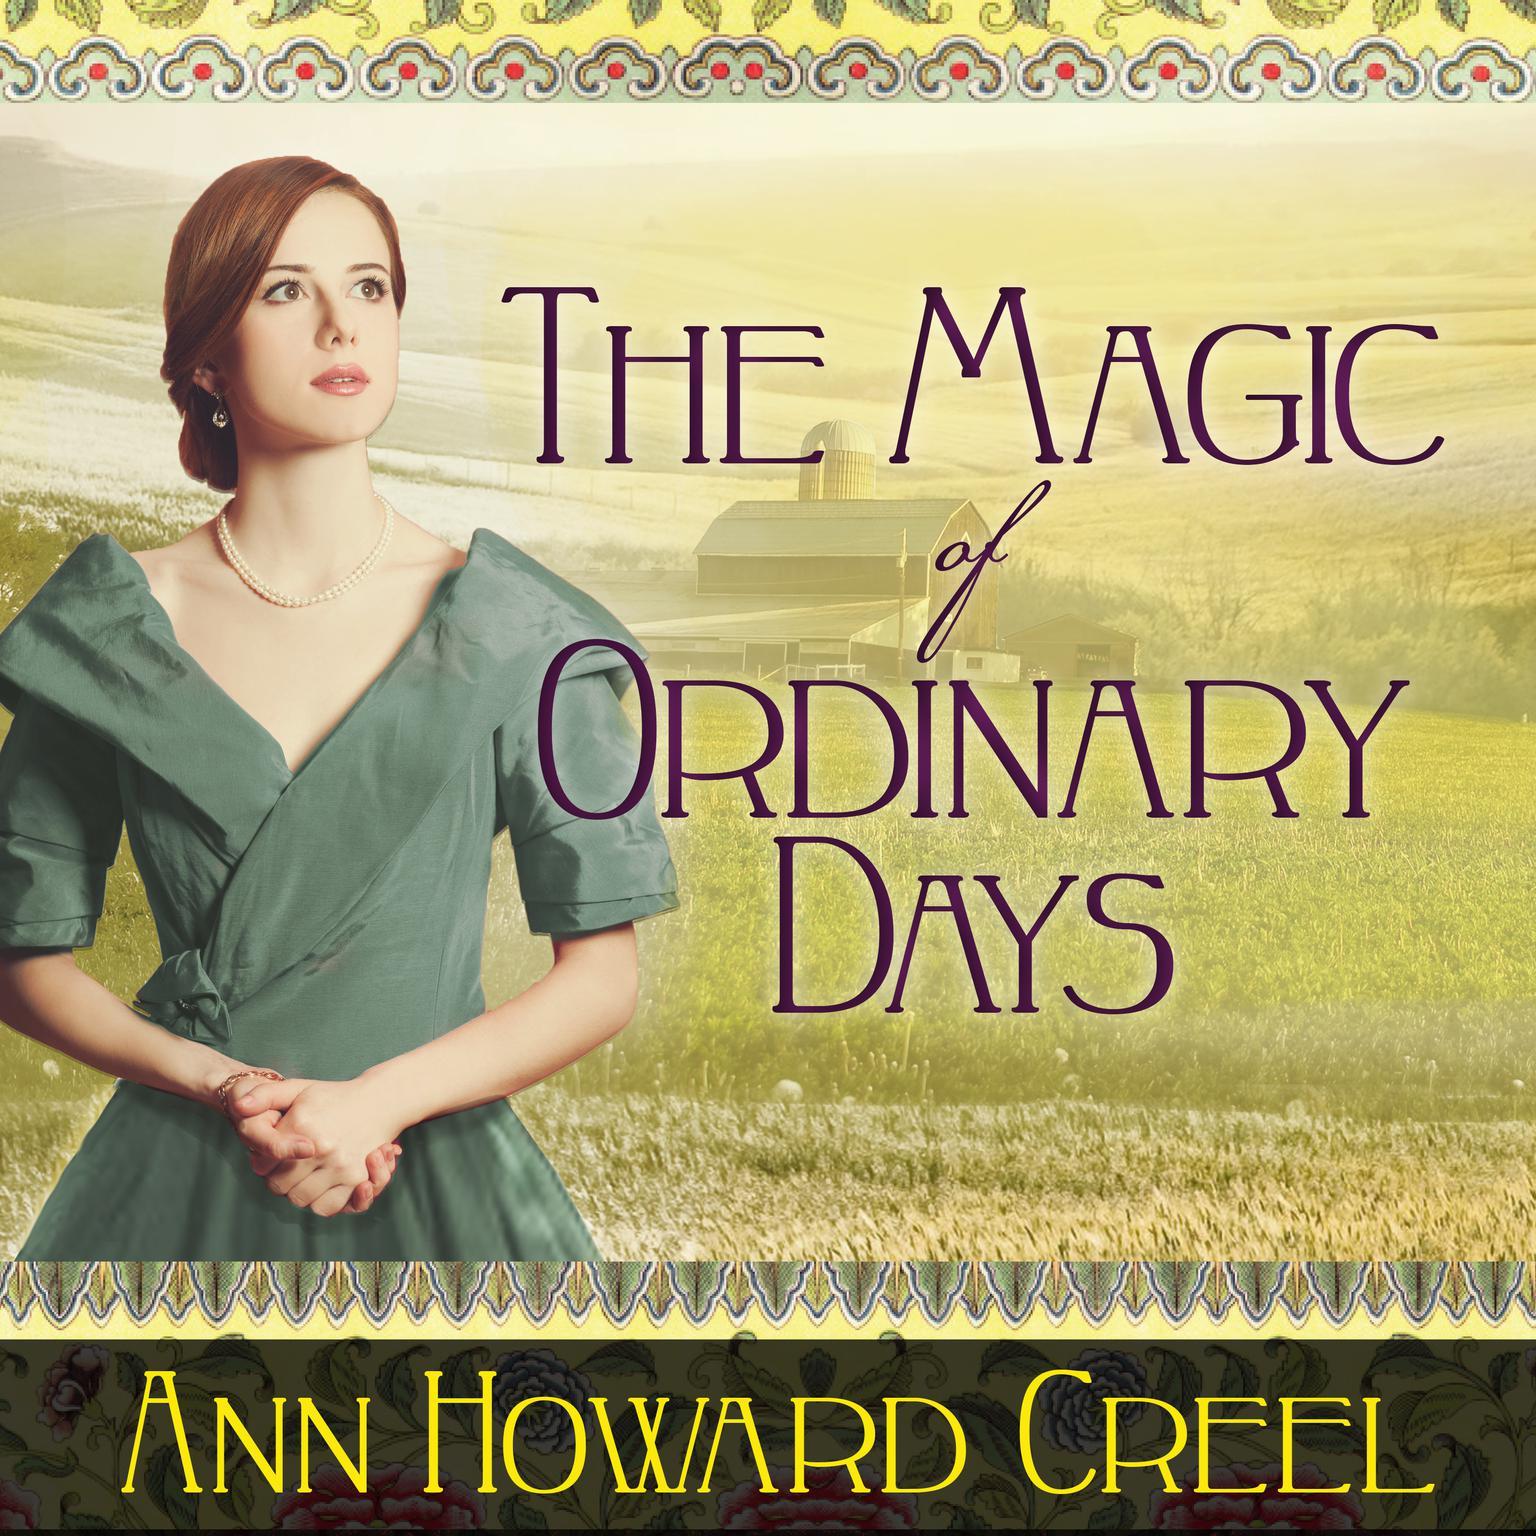 The Magic of Ordinary Days: A Novel Audiobook, by Ann Howard Creel